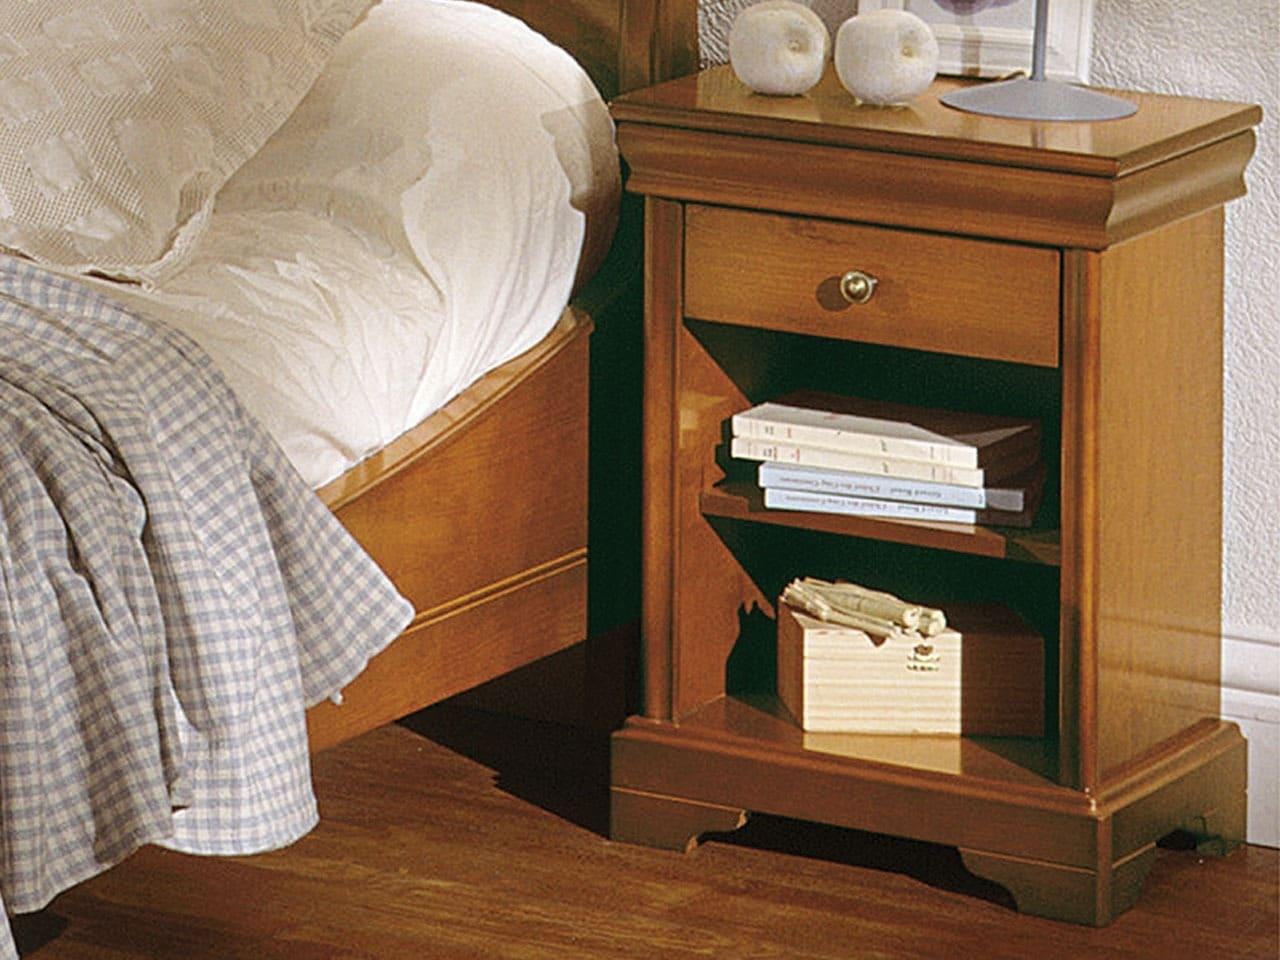 Table de chevet nina style louis philippe 1 tiroir meubles minet